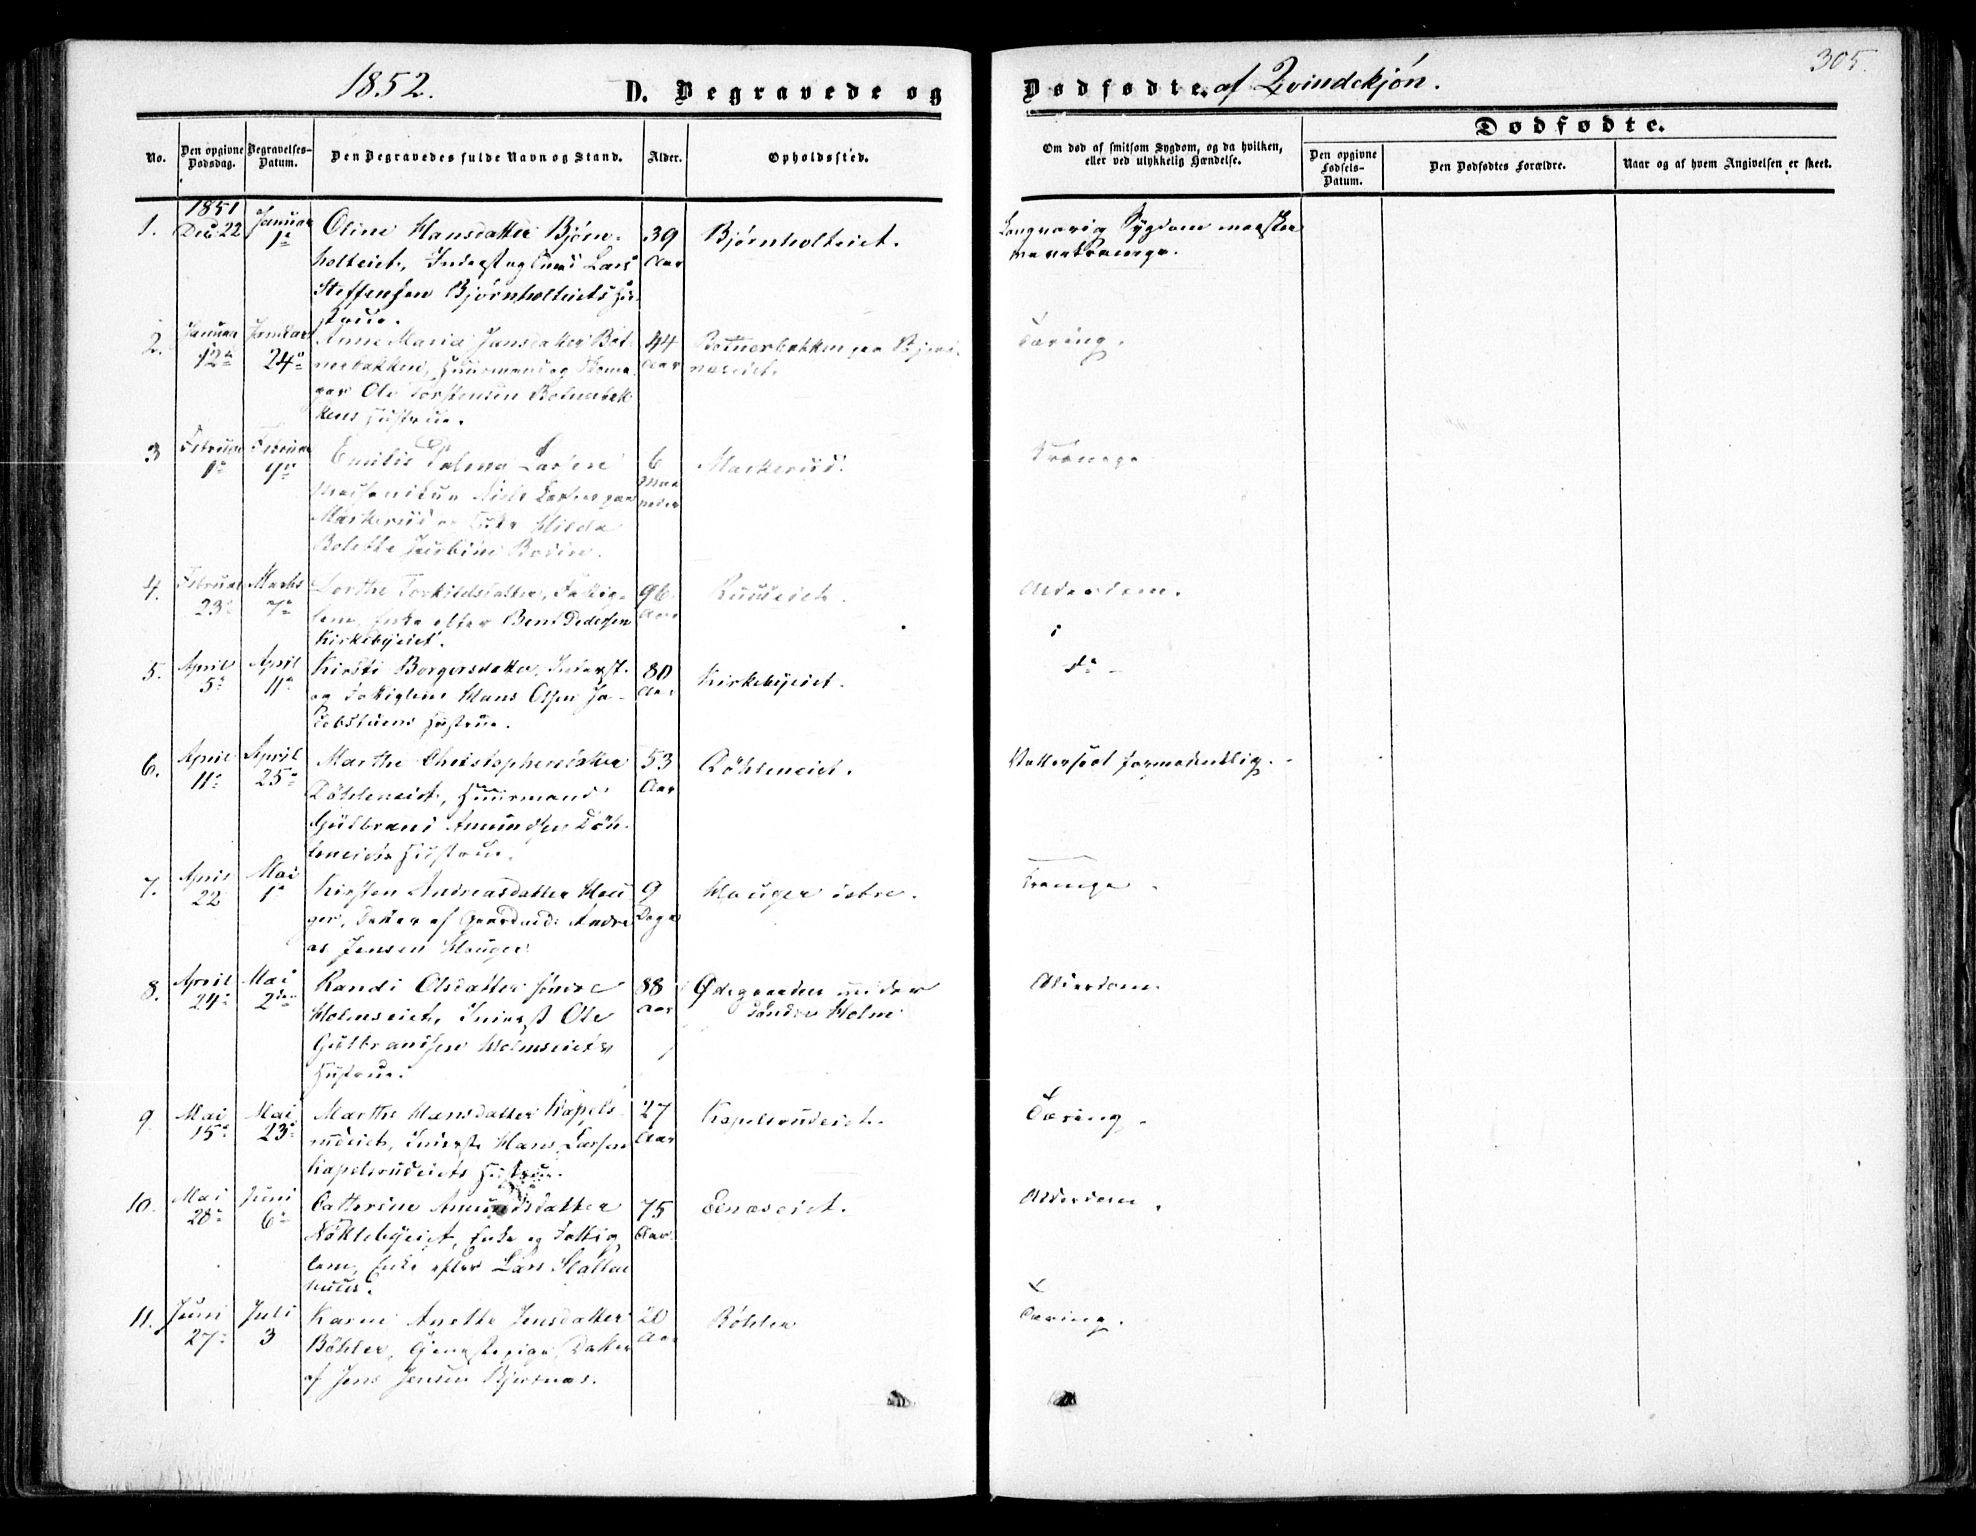 SAO, Nittedal prestekontor Kirkebøker, F/Fa/L0005: Ministerialbok nr. I 5, 1850-1862, s. 305